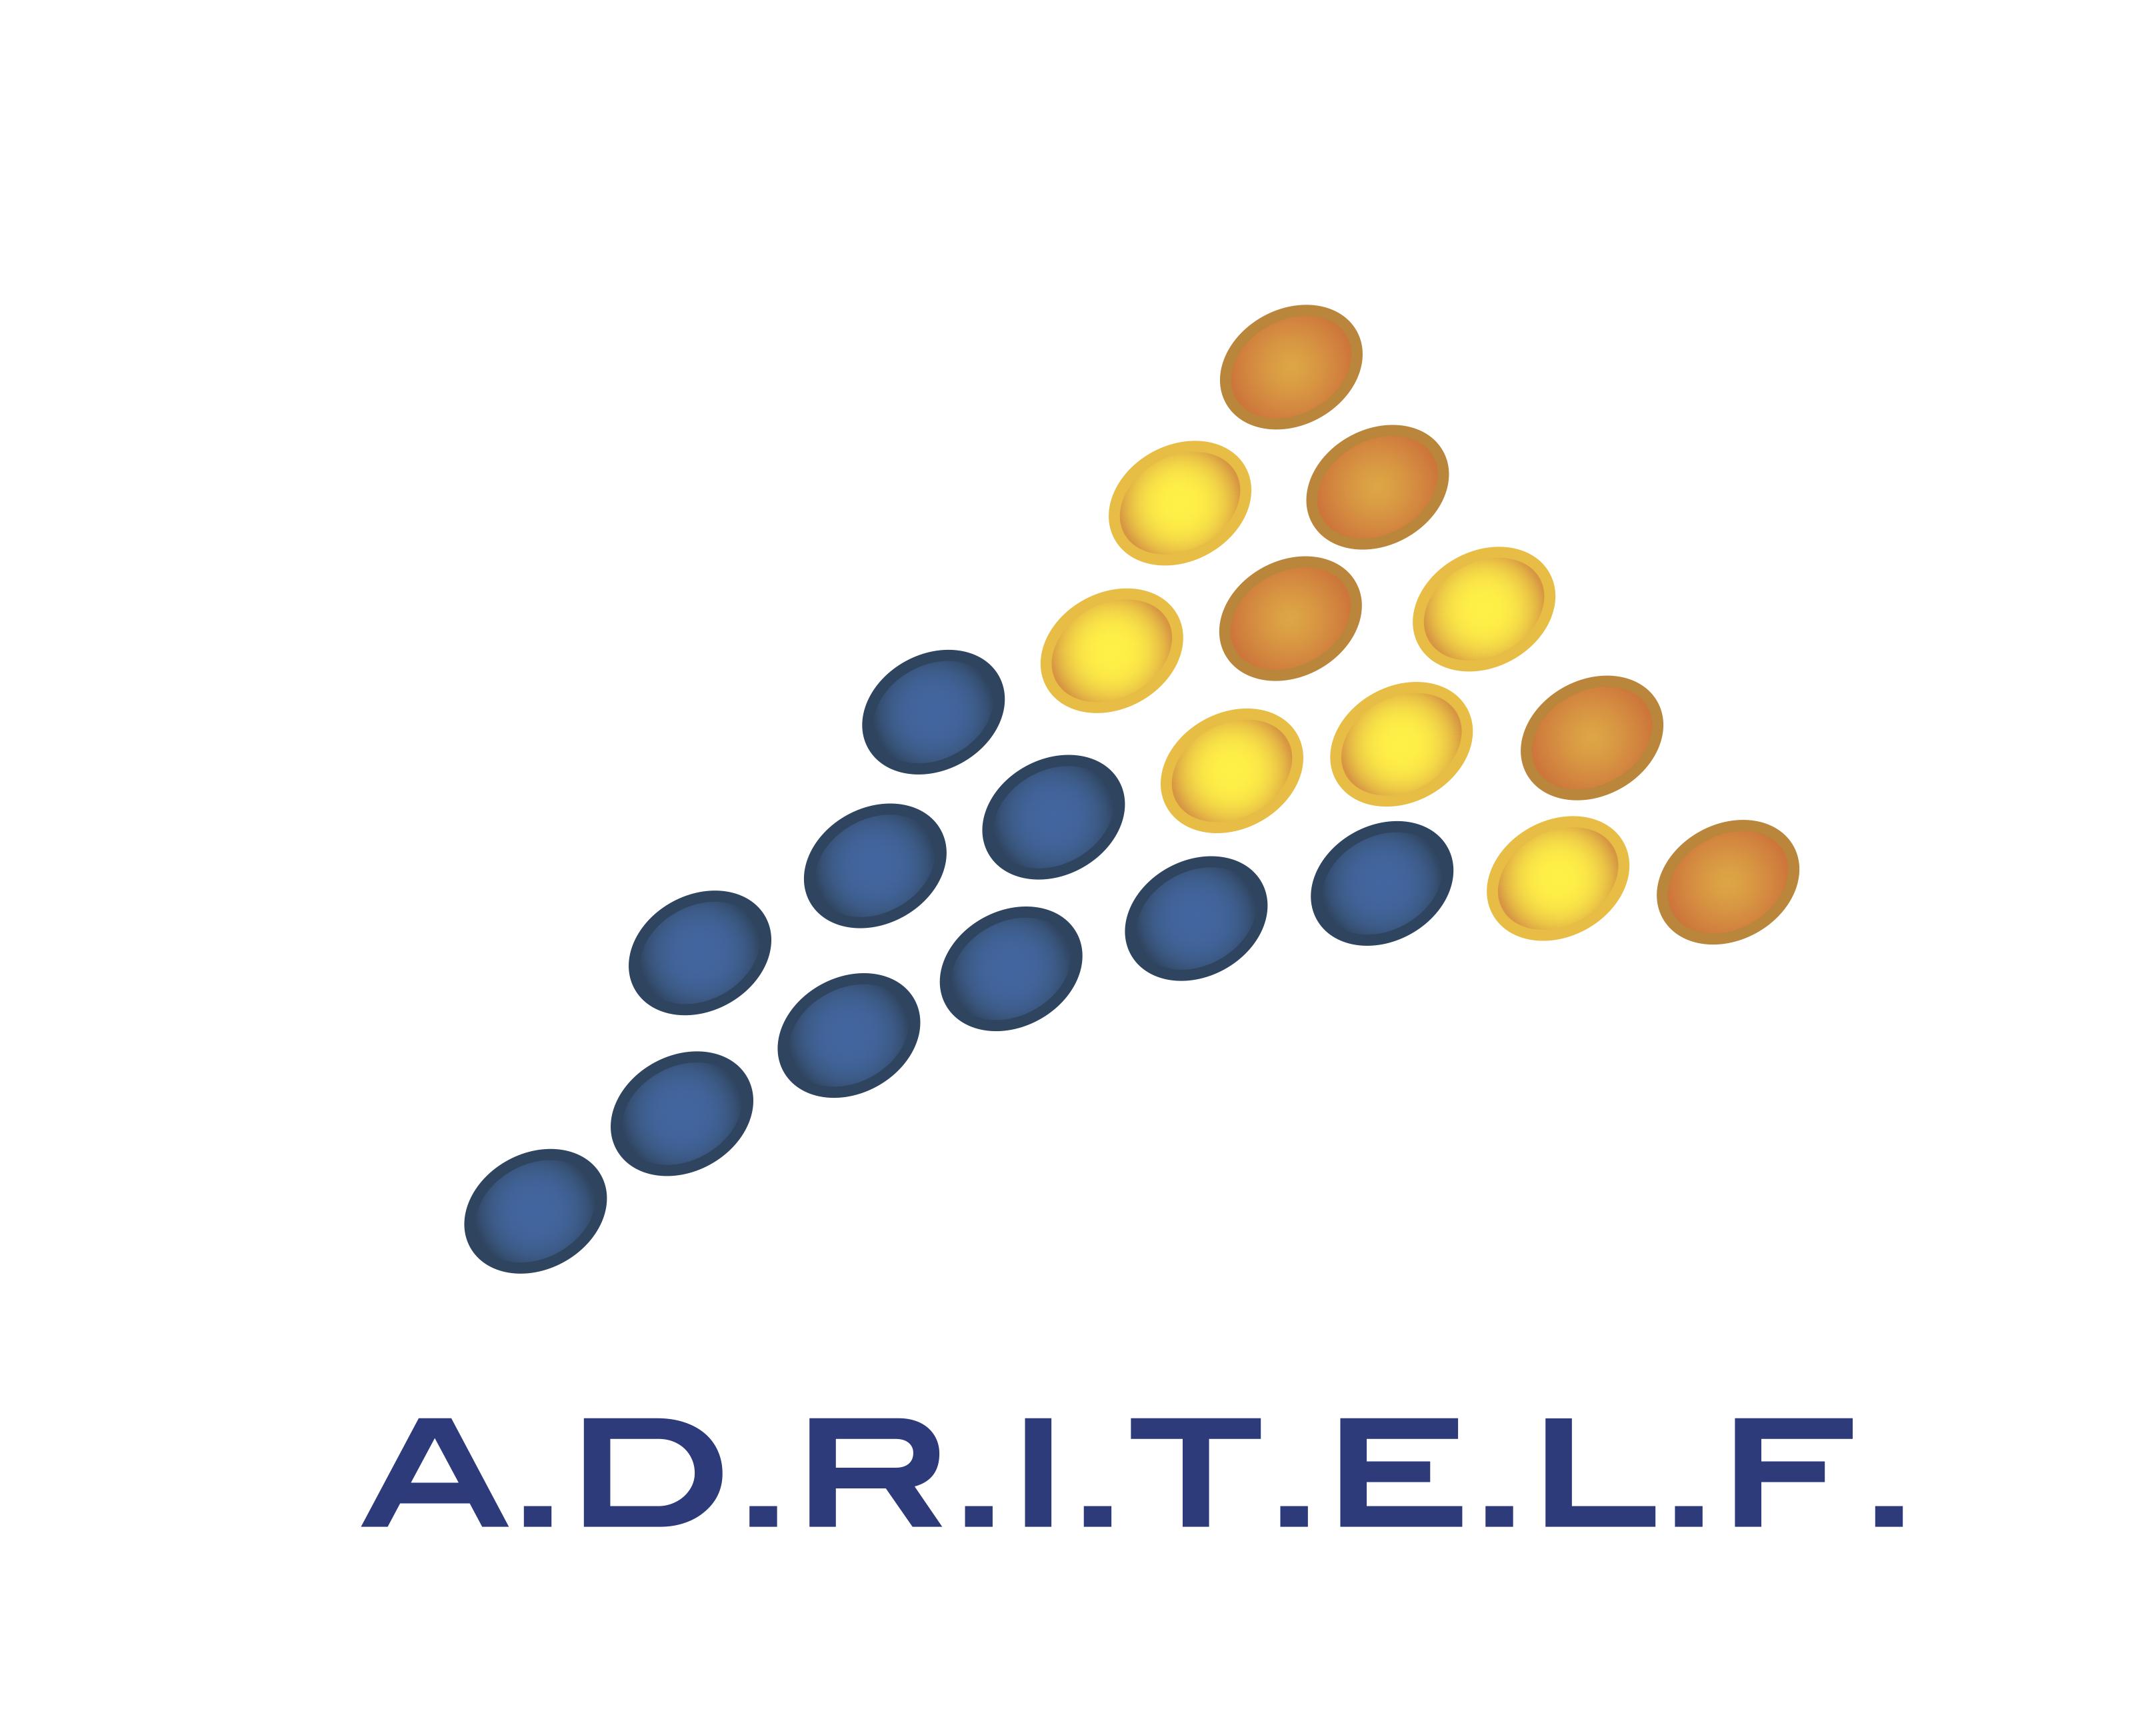 Adritelf